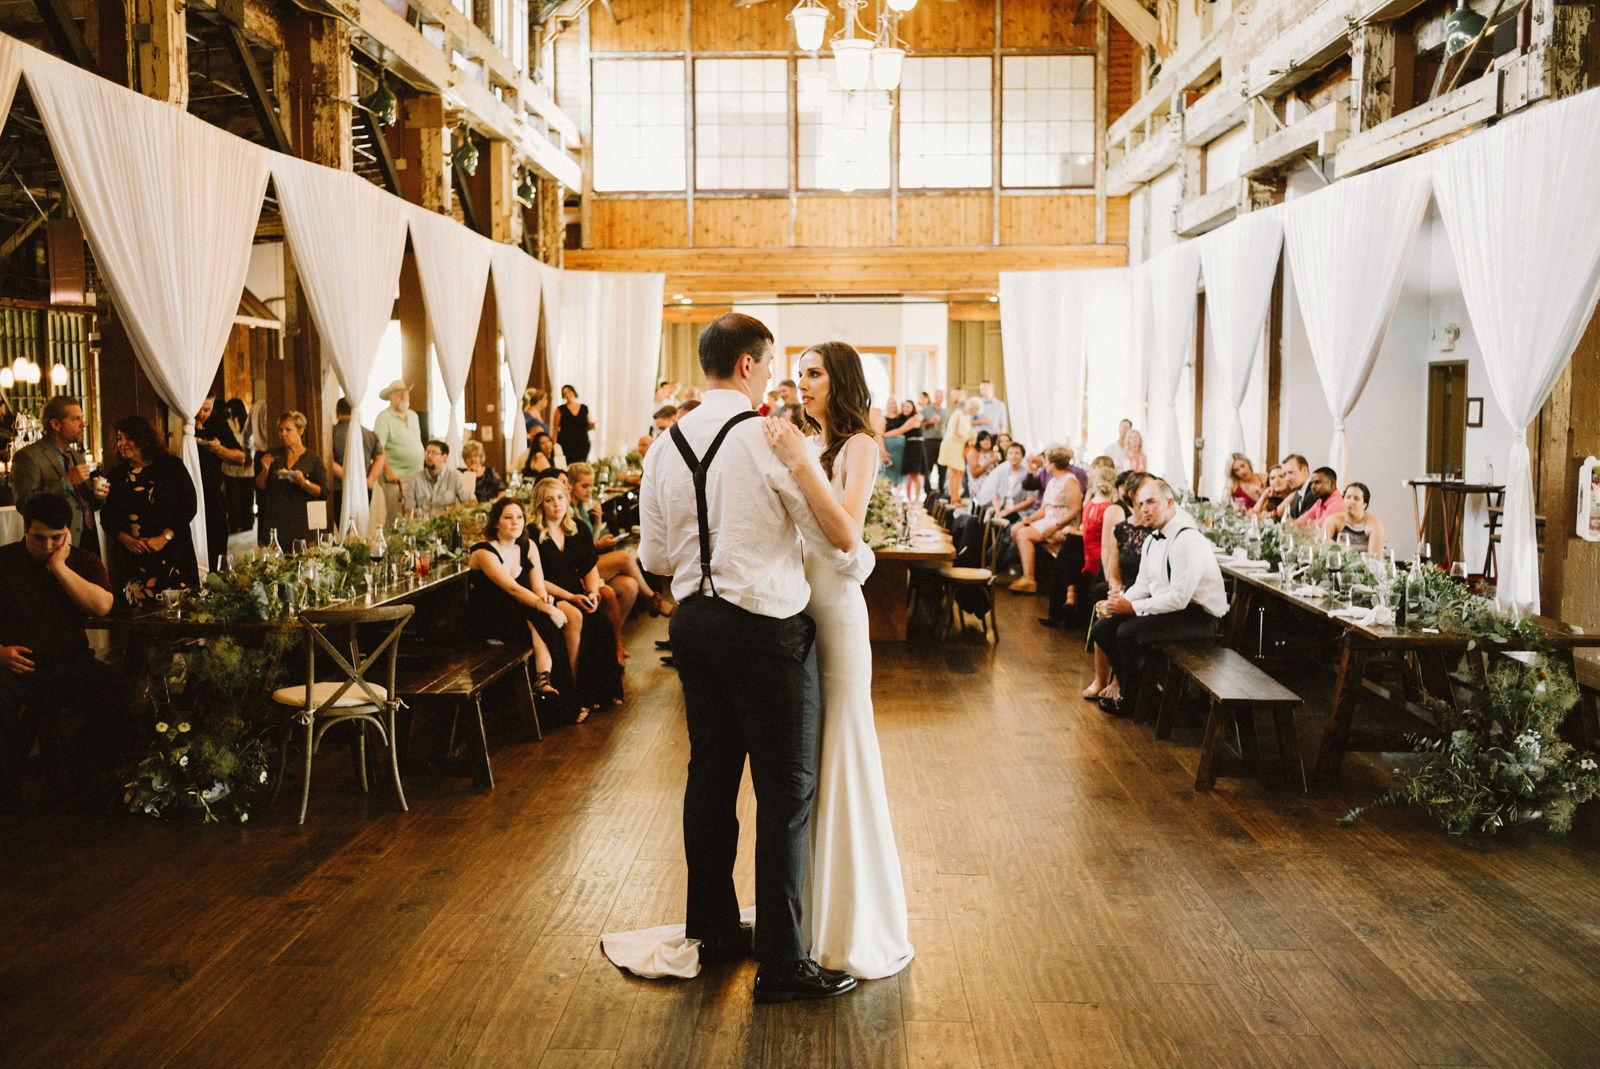 sodo-park-wedding-078 SODO PARK WEDDING